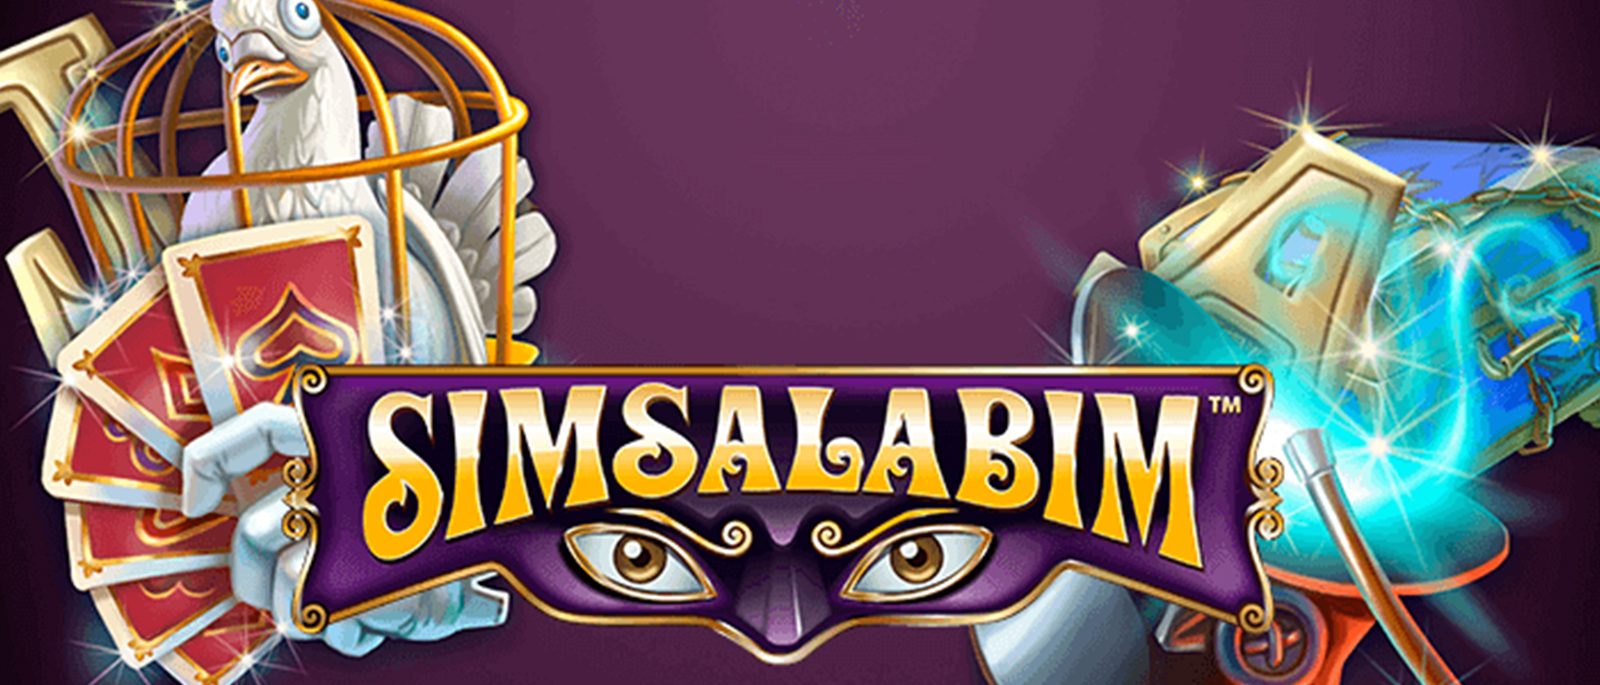 Simsalabim Slot - Spela Simsalabim Slots Gratis Online